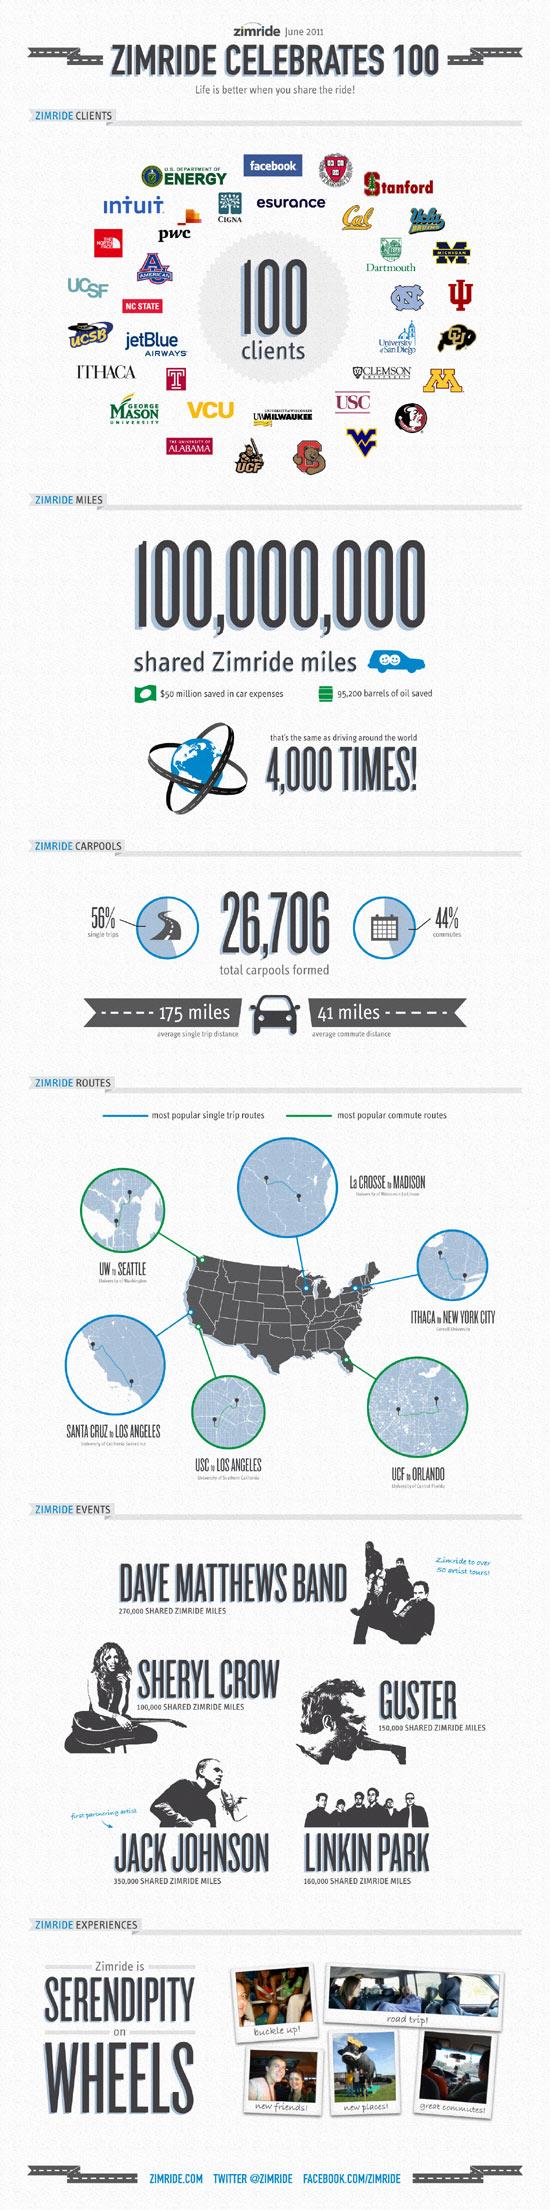 zimride-100-infographic